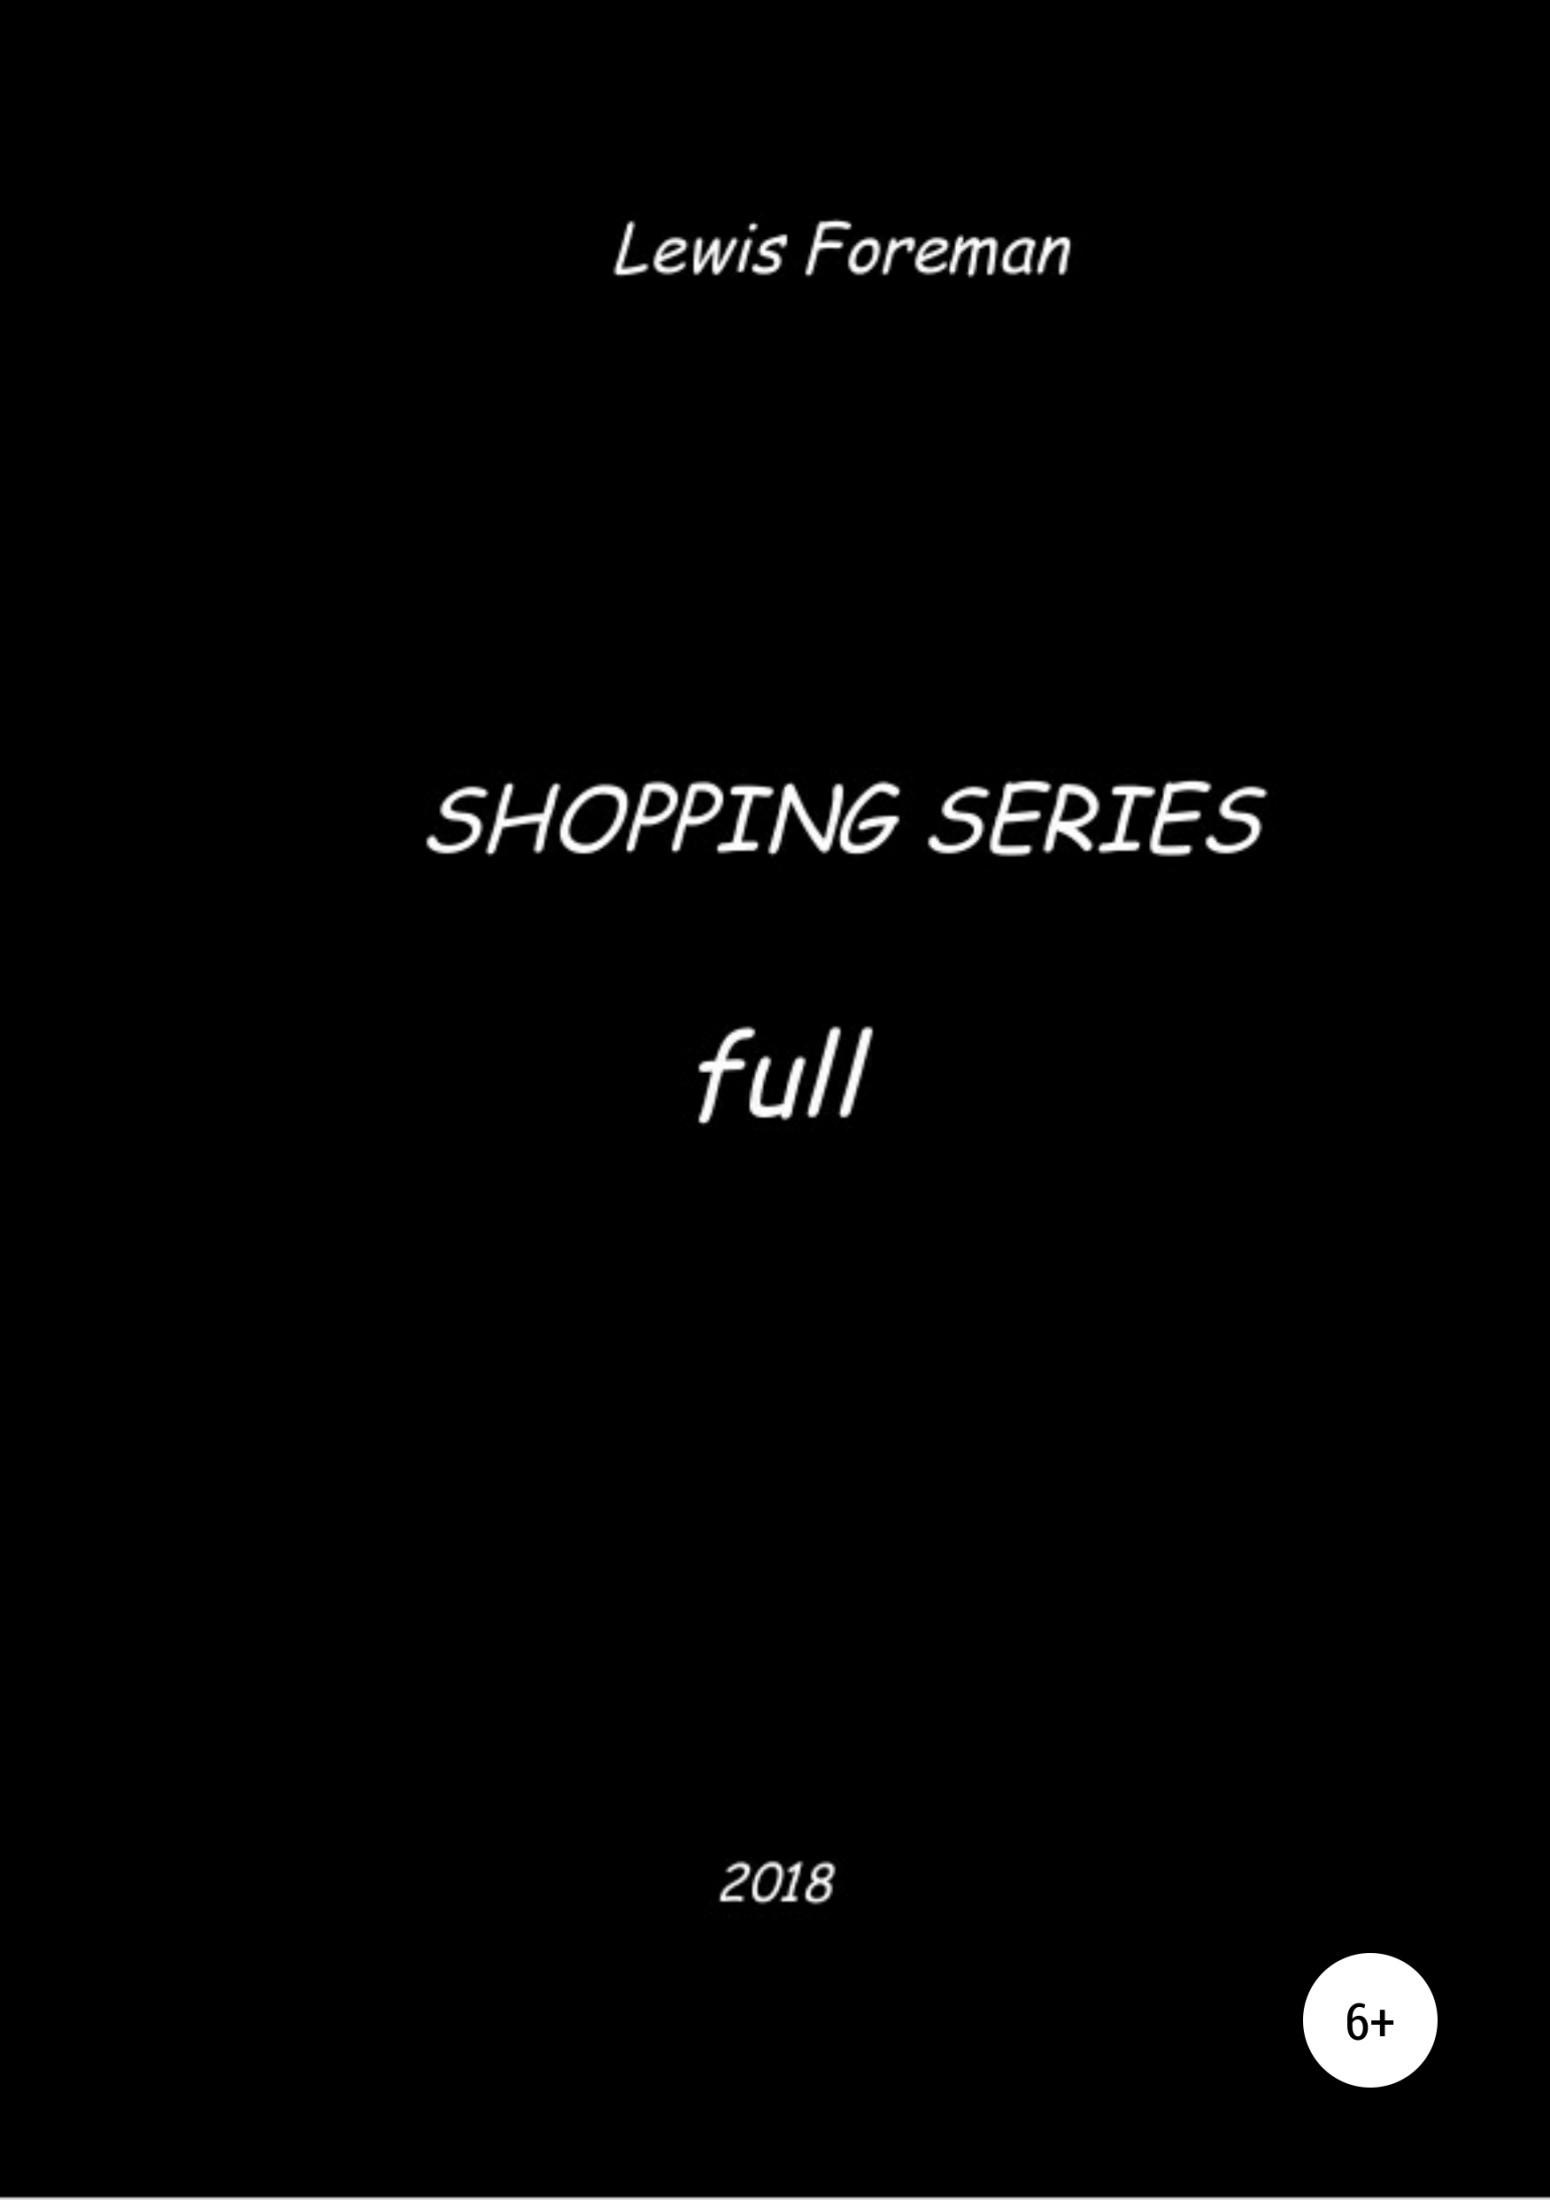 Lewis Foreman Shopping Series. Full xpoмированные гантели foreman fm нcd 8kg 8кг пара xpoмиpoвaнныe гaнтeли foreman fm hcd 8kg 8кг пapa